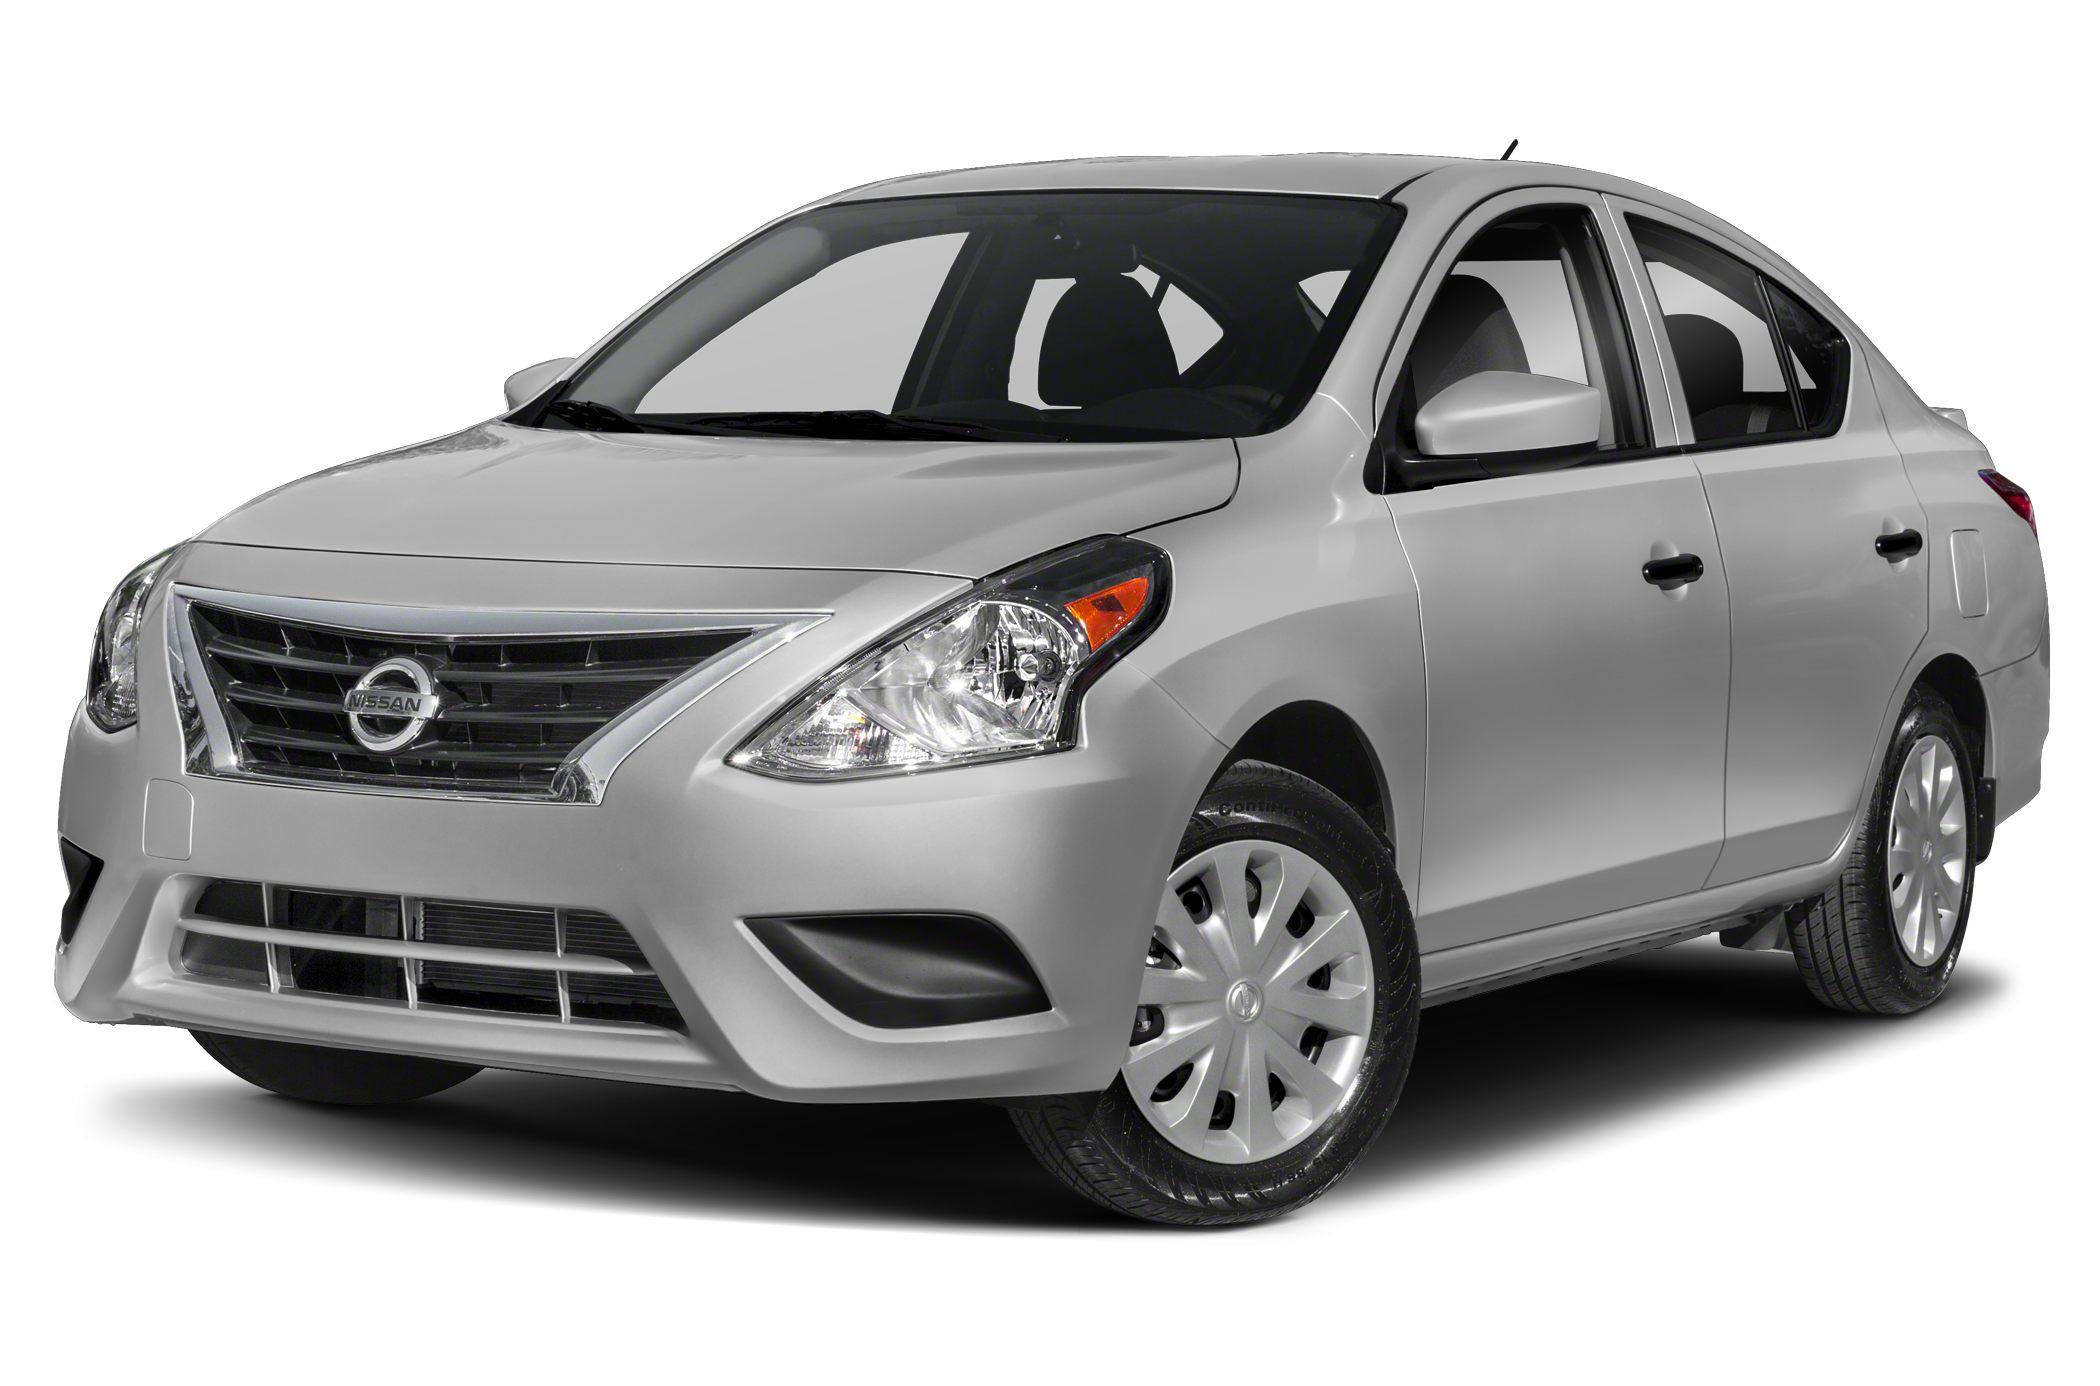 Nissan Versa 2018 >> 2018 Nissan Versa Styles Features Highlights